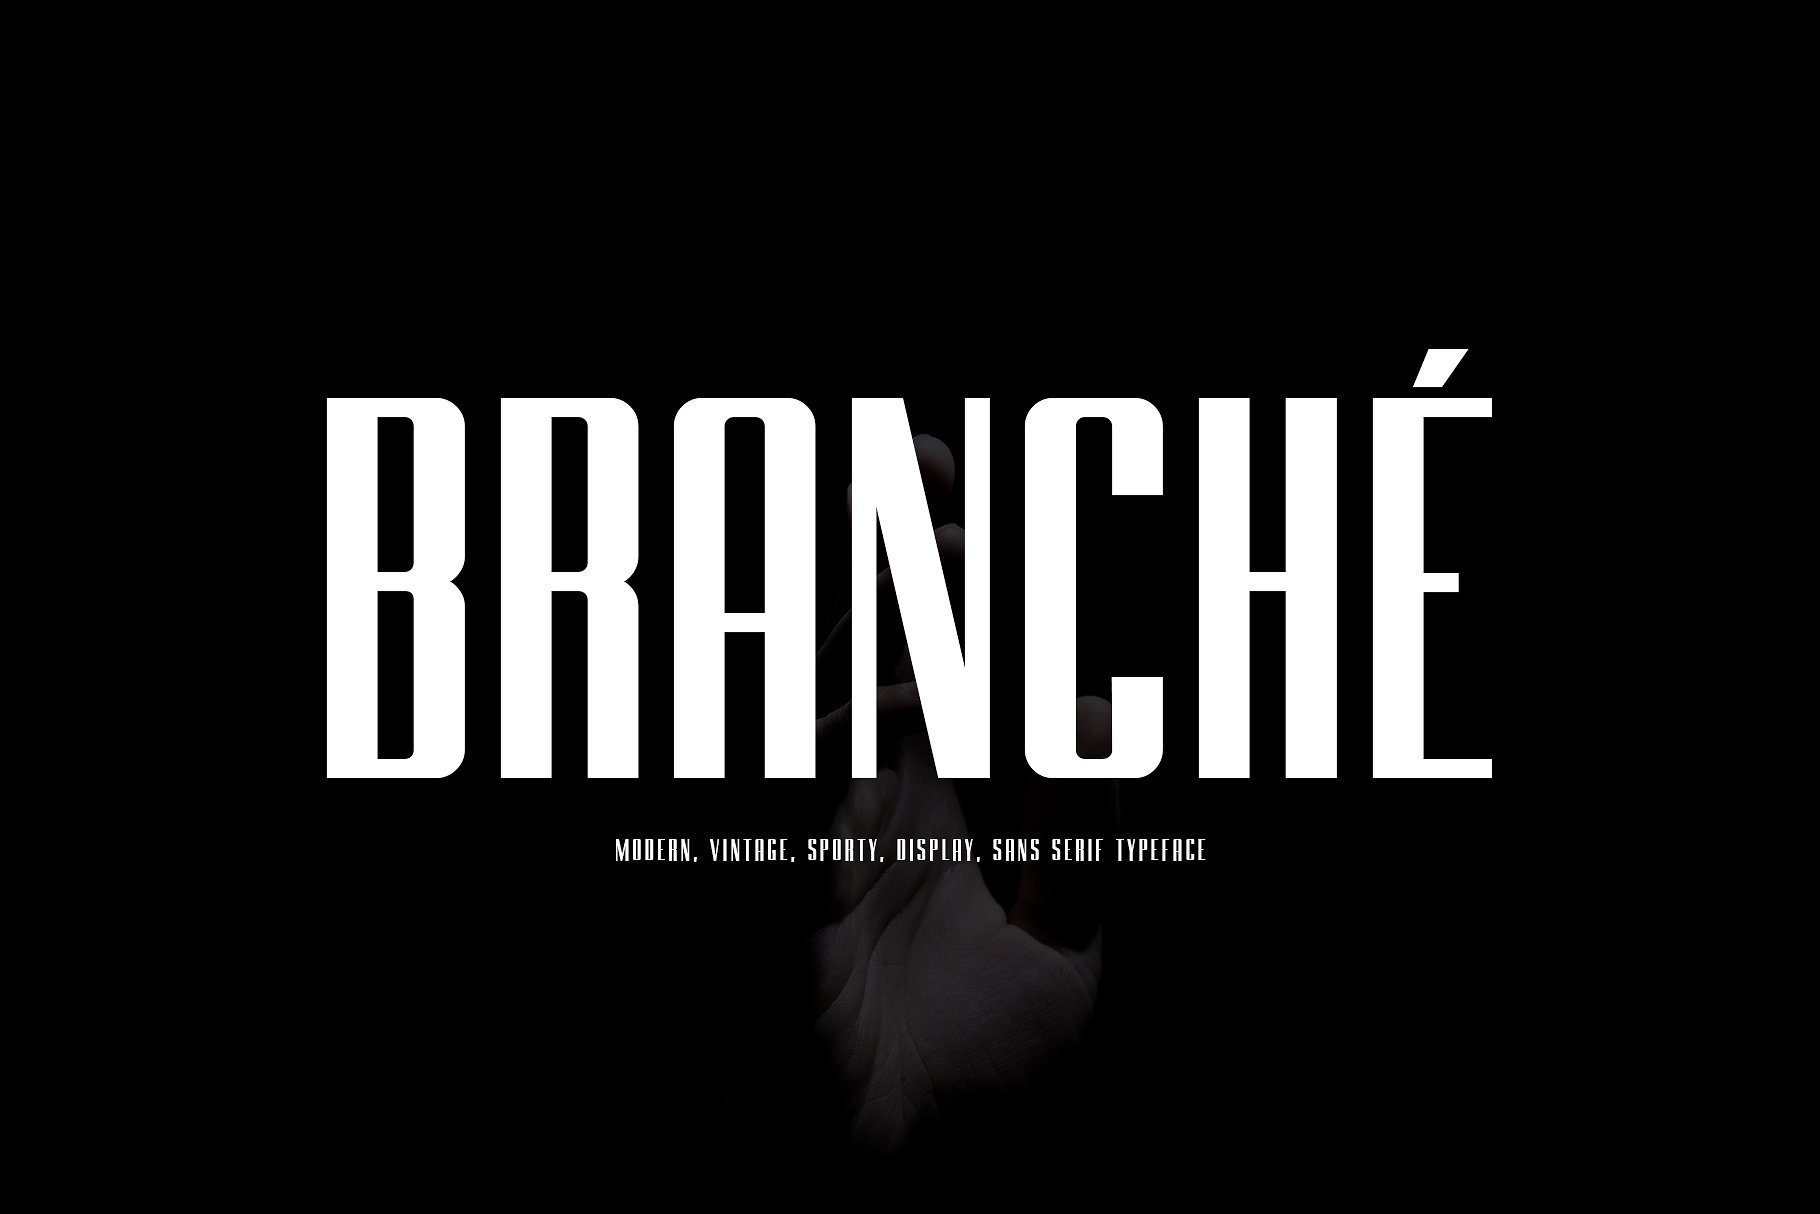 branche-typeface